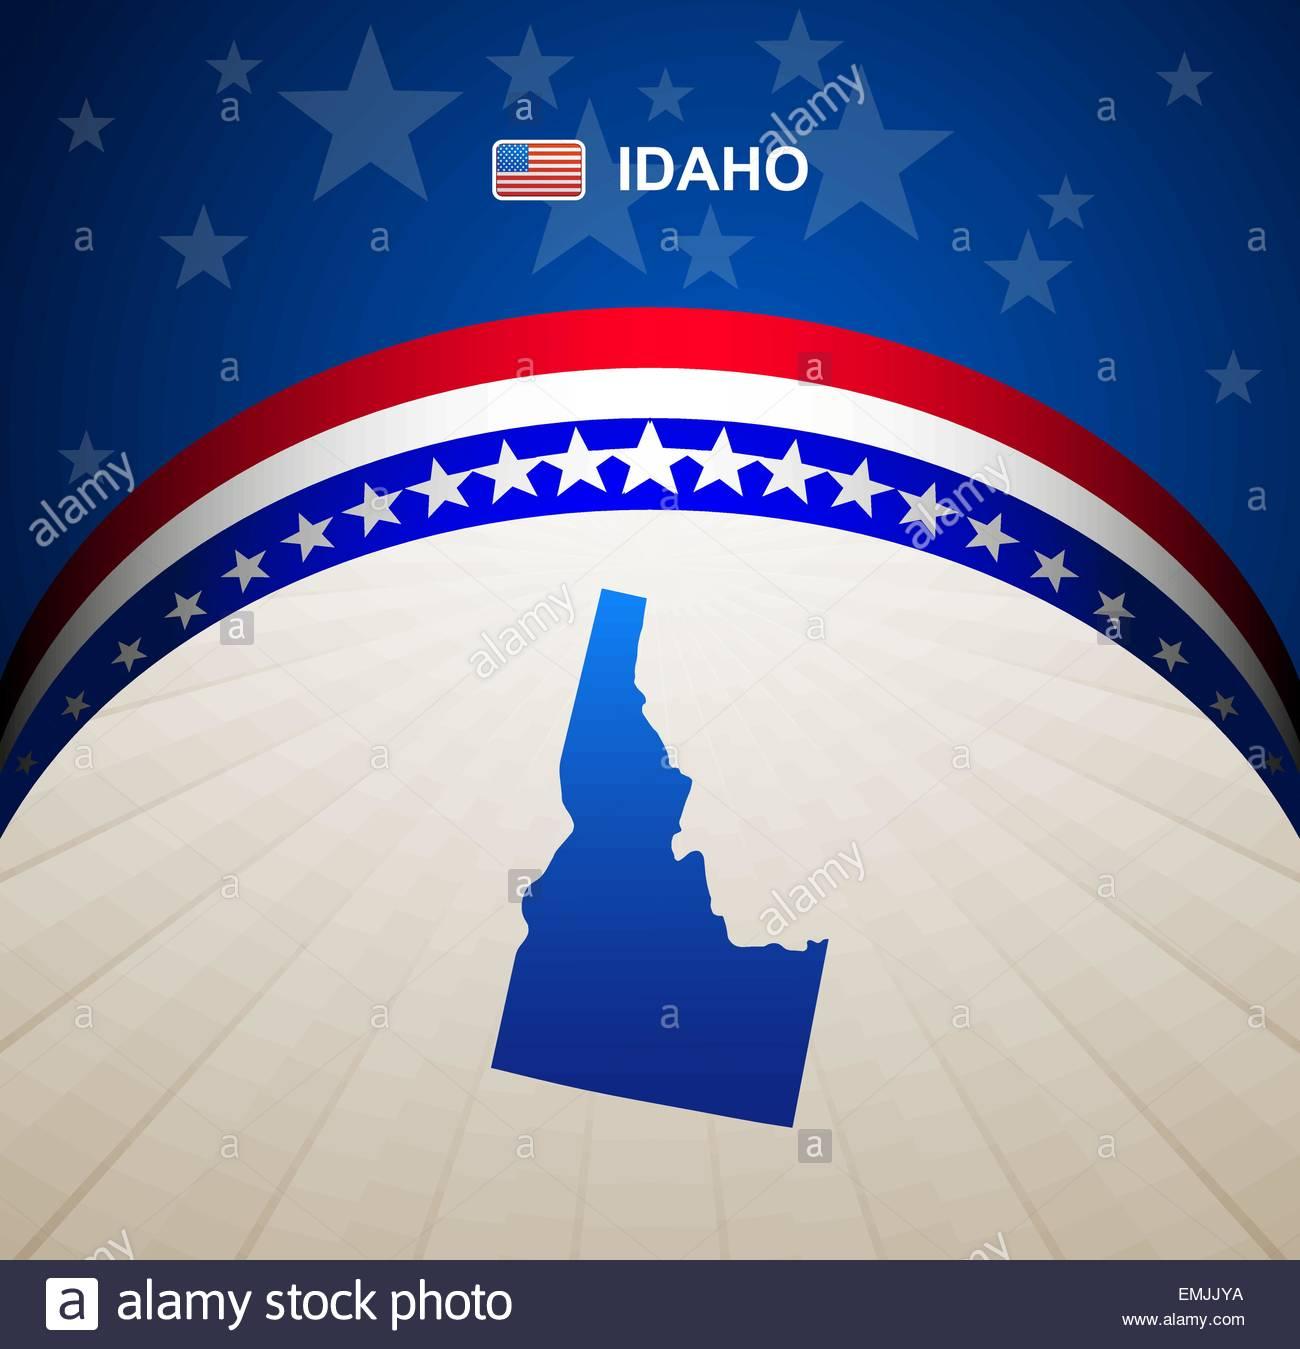 Idaho map vector background - Stock Vector